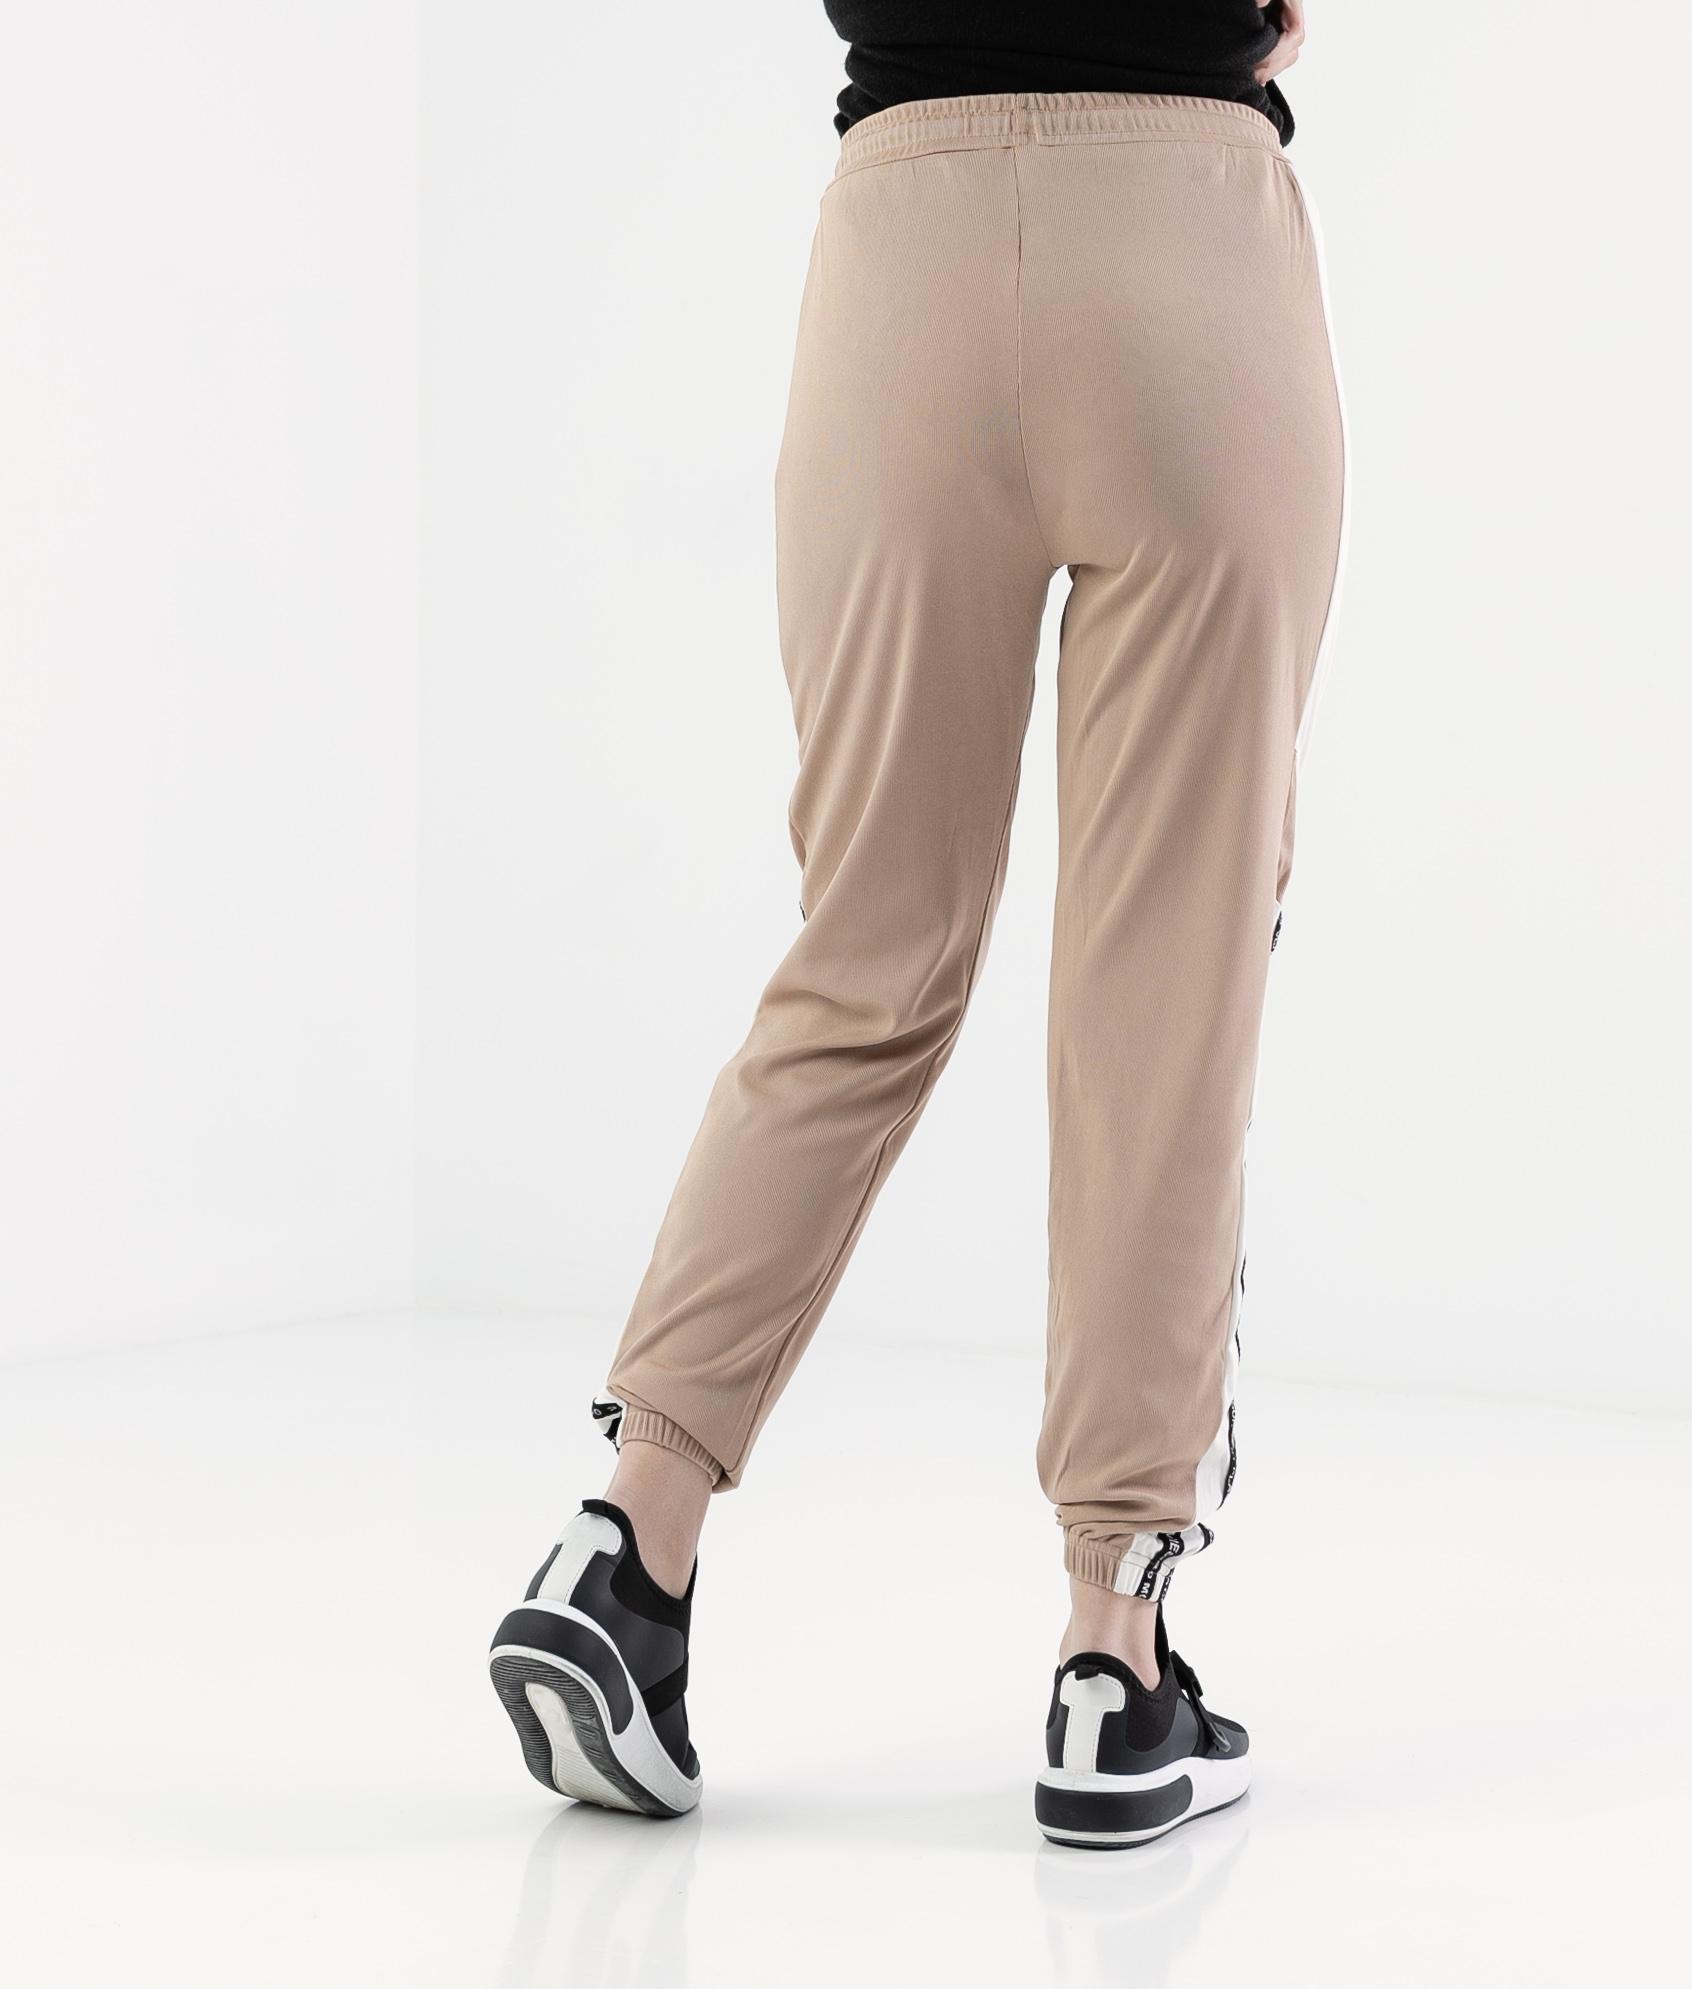 Pantalón Unoli - Camel